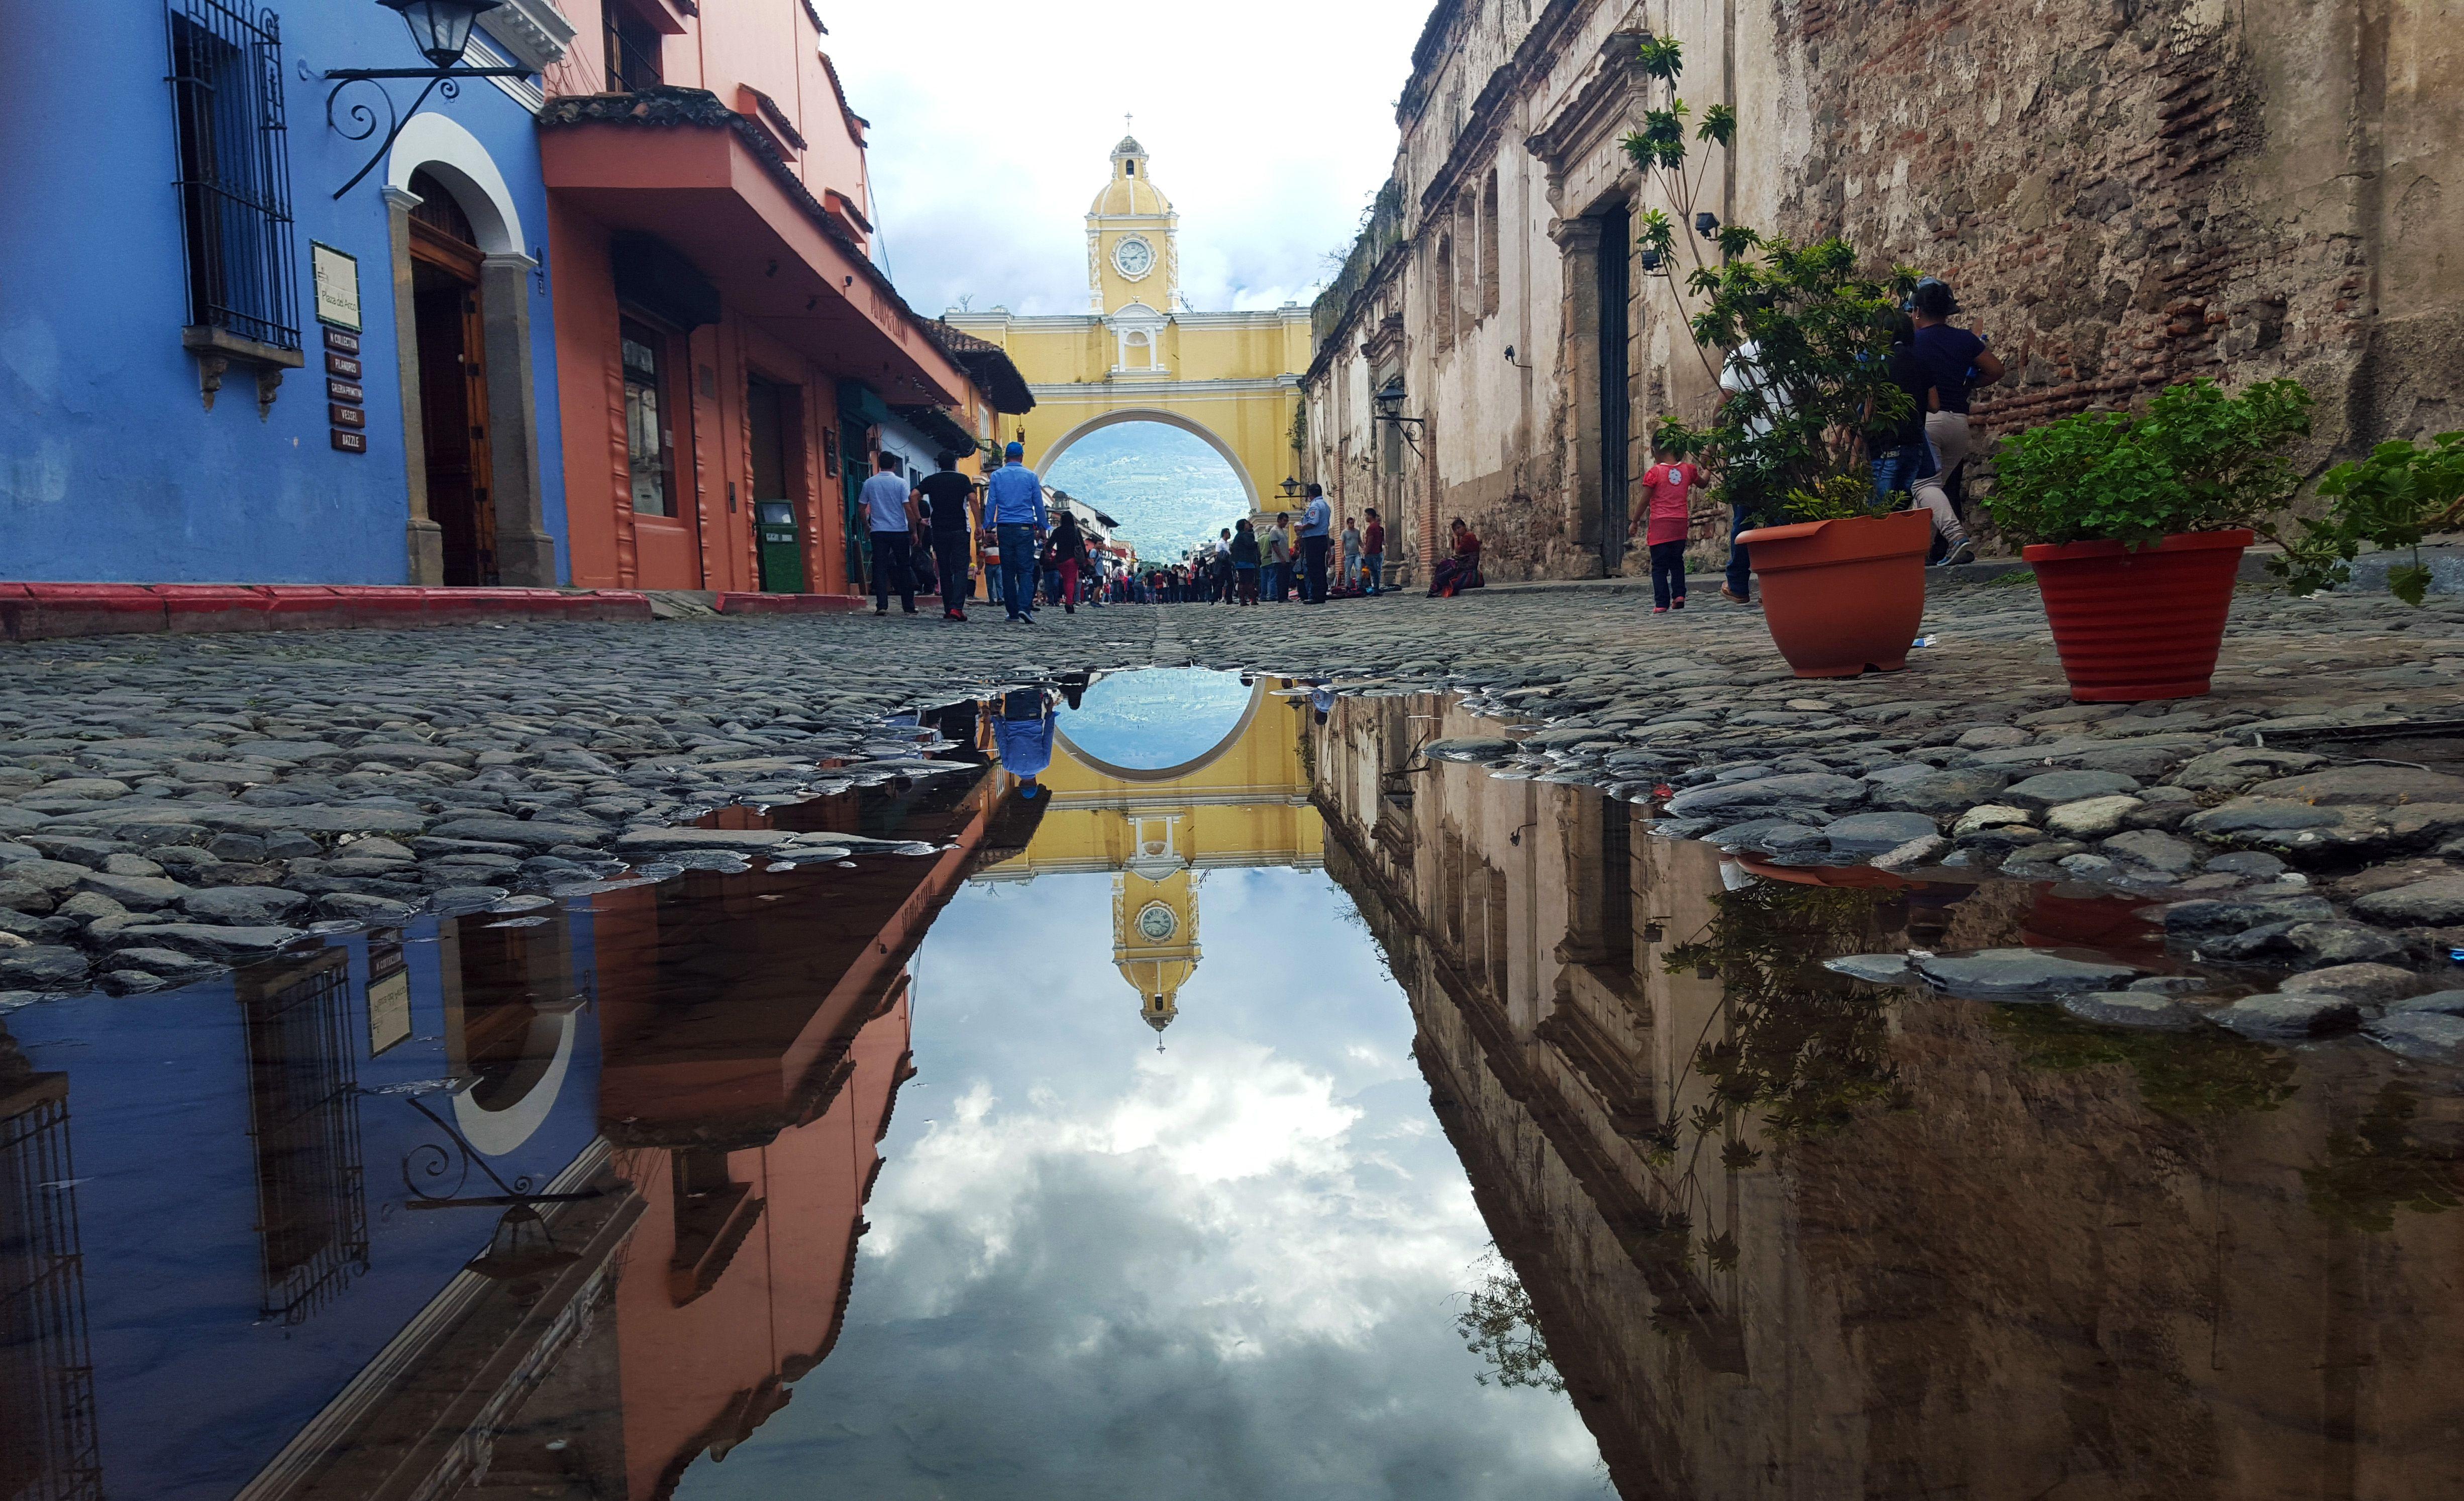 Arco de Santa Catalina  #Guatemala, #Antigua #Guatelinda #VisitGuatemala